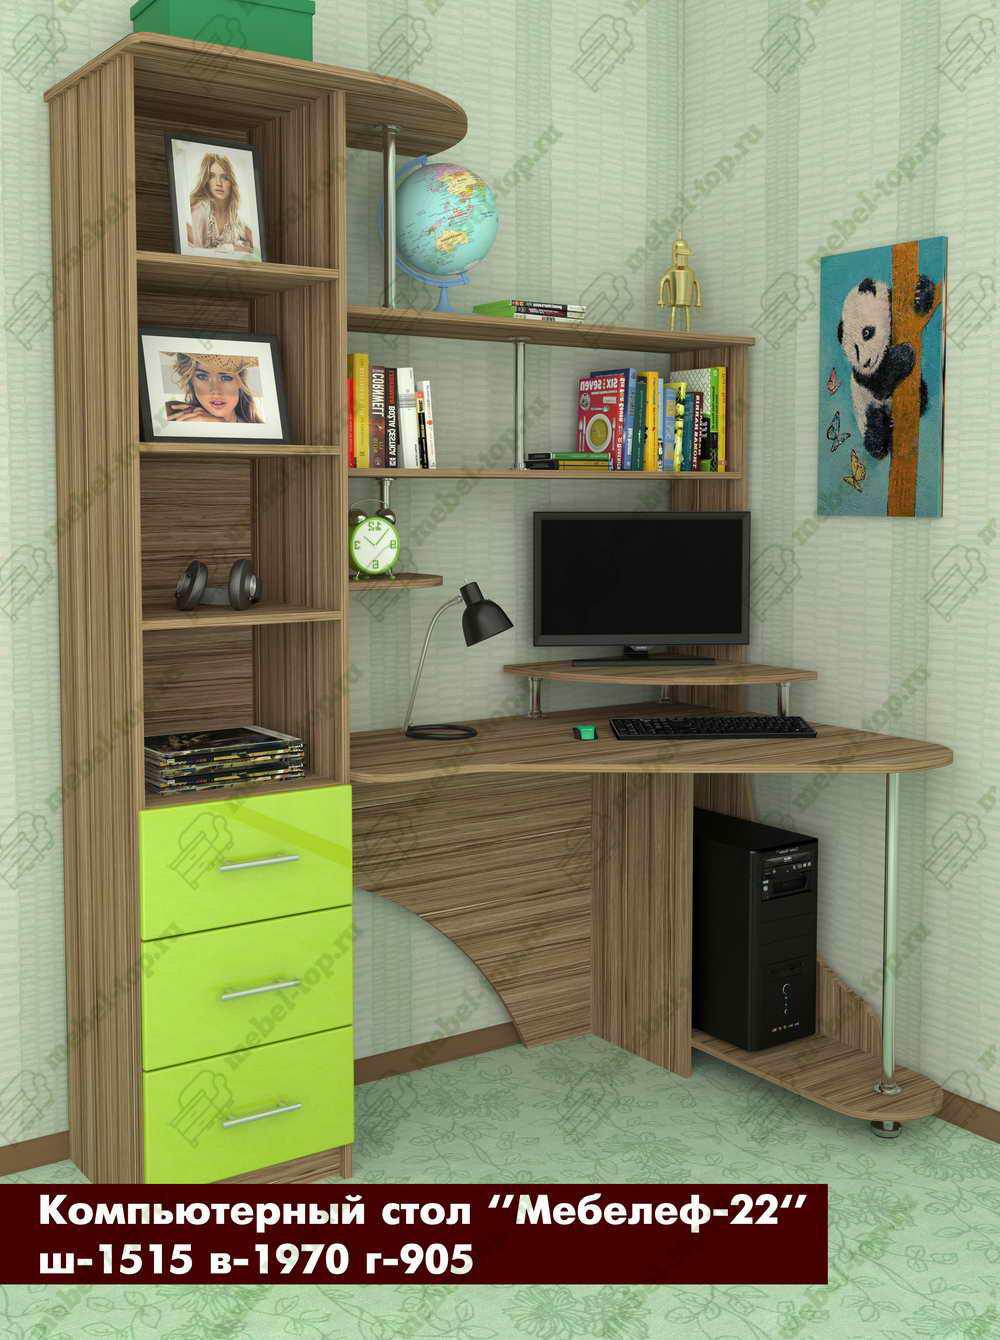 Компьютерный стол Мебелеф-22 стенка мебелеф 5